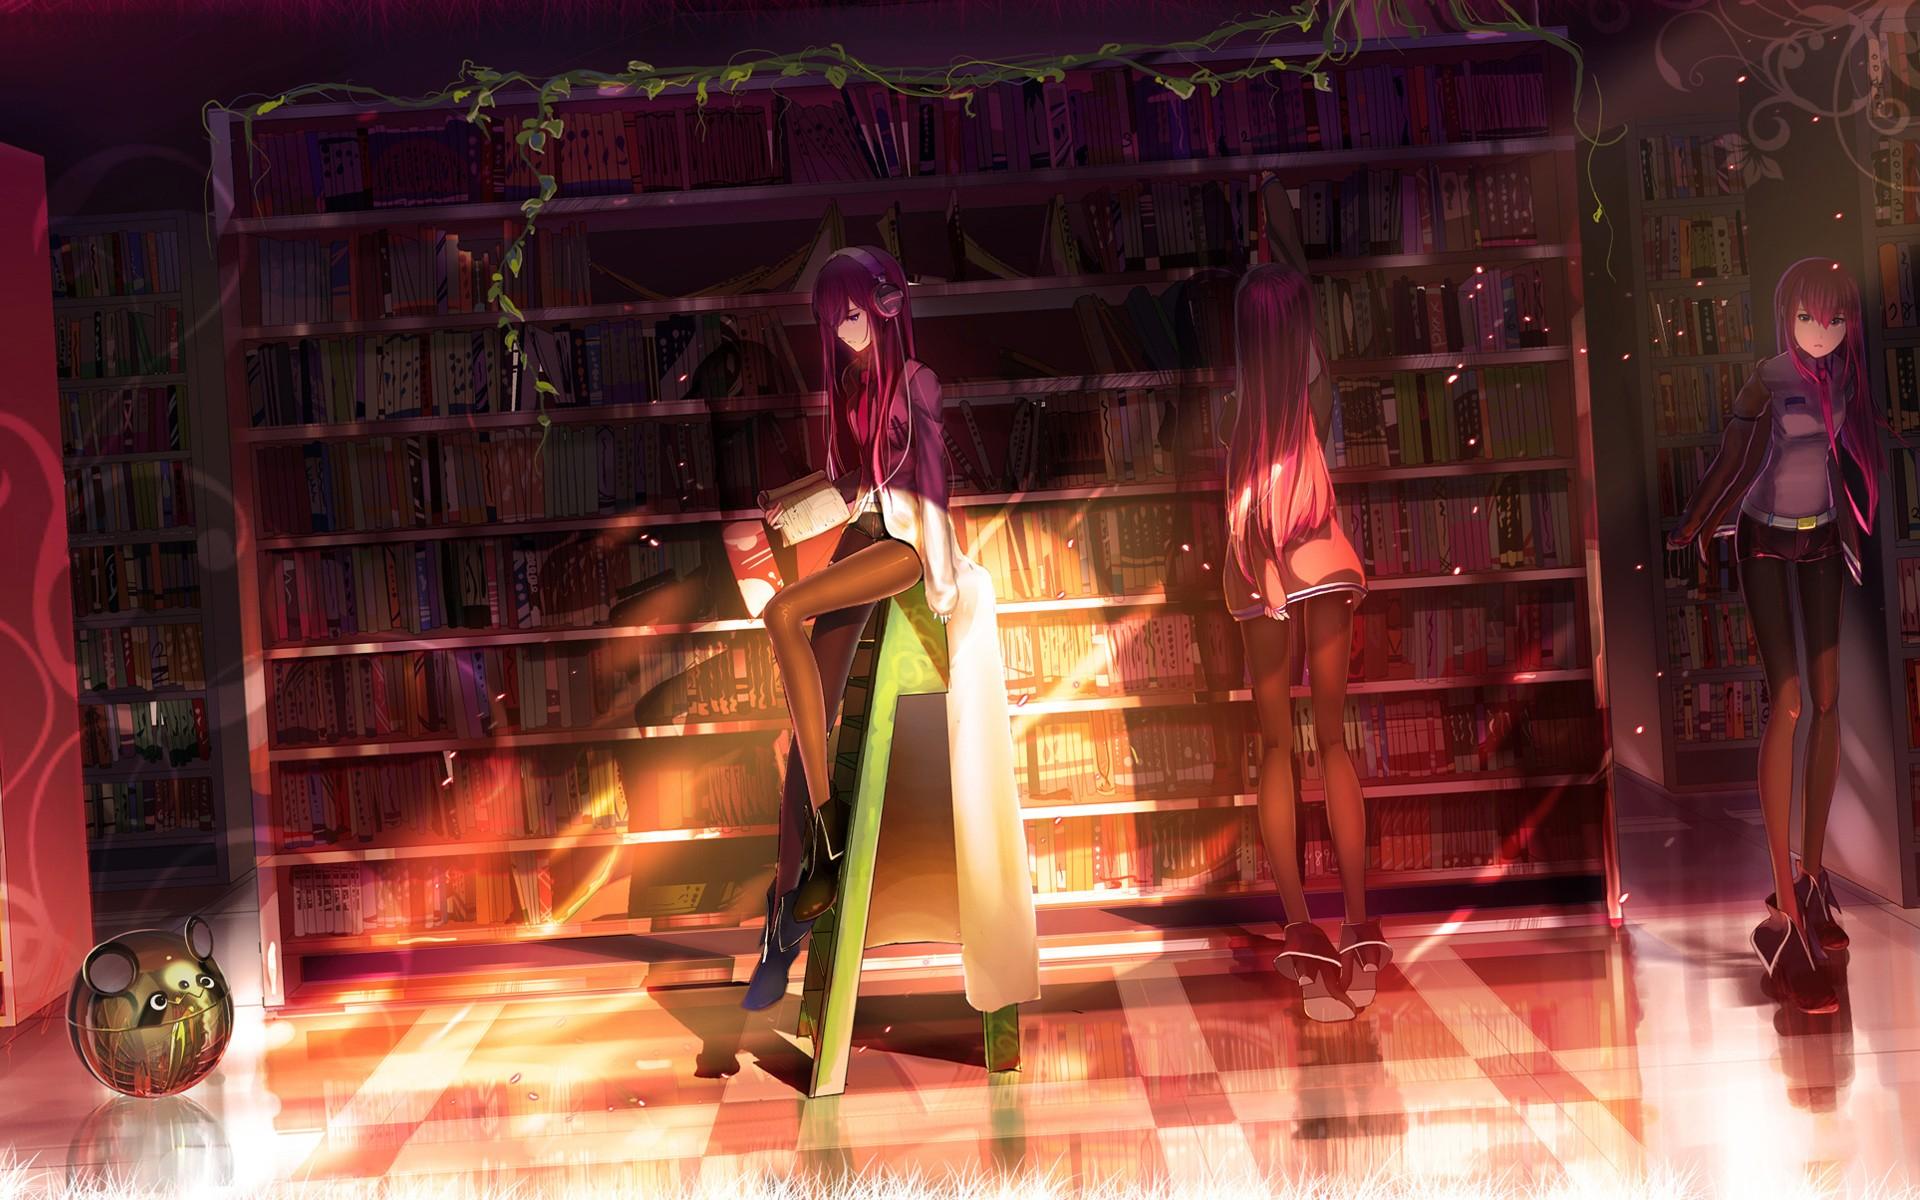 Headphones Library Anime Steinsgate Makise Kurisu Girls Wallpaper